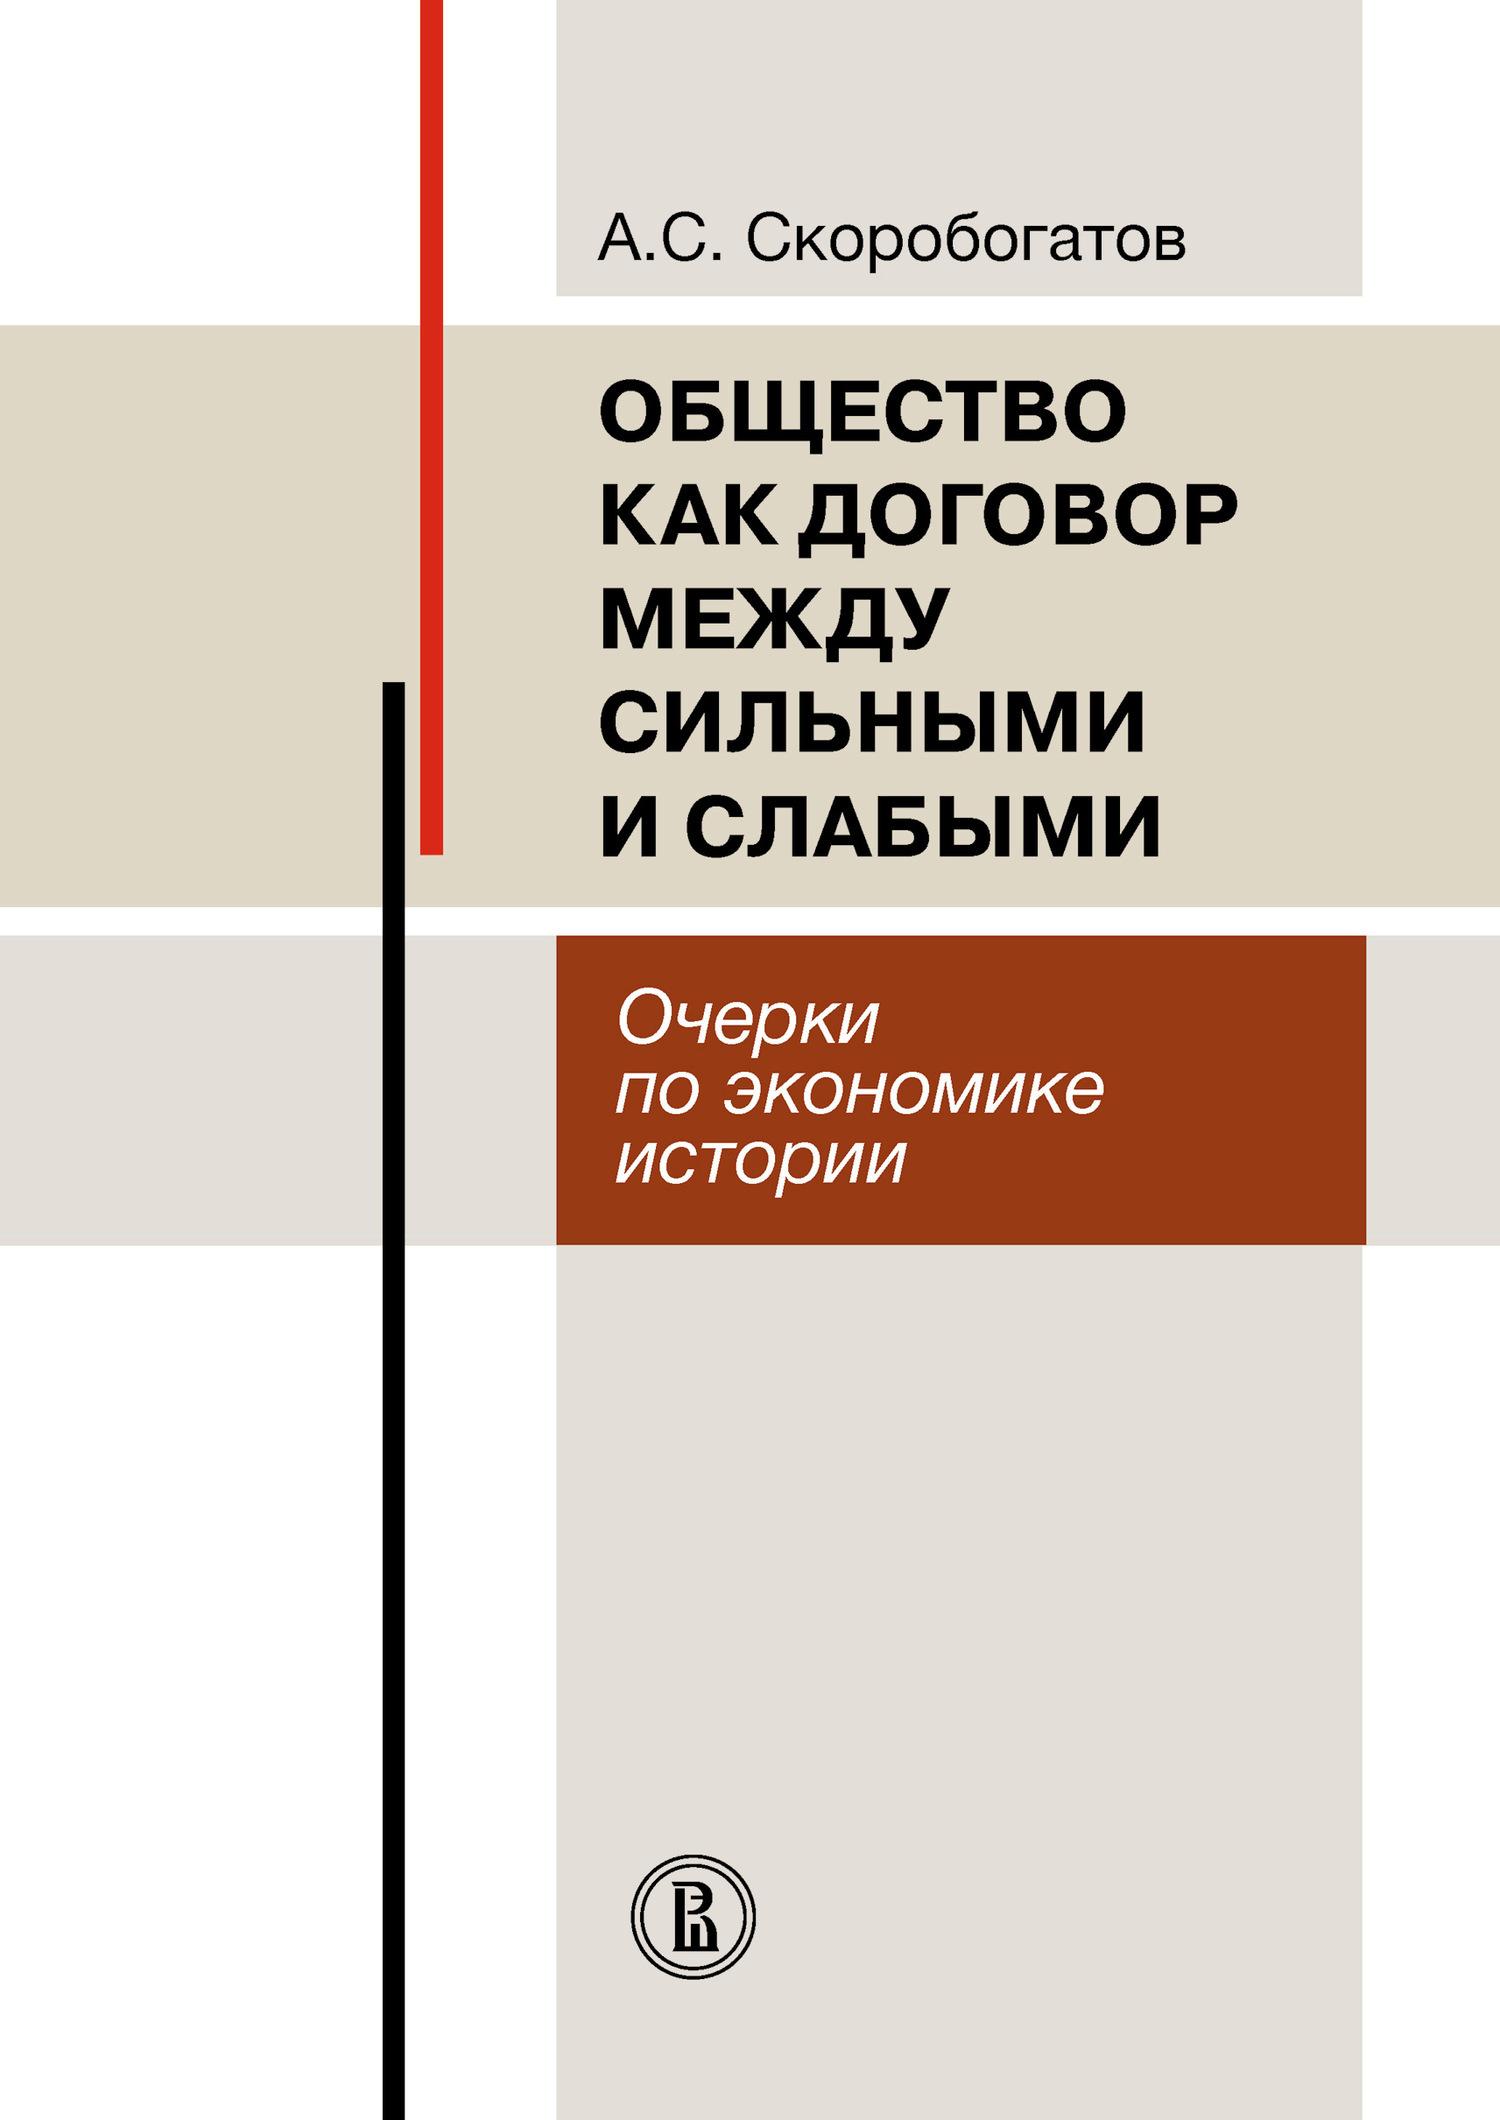 Обложка книги. Автор - Александр Скоробогатов